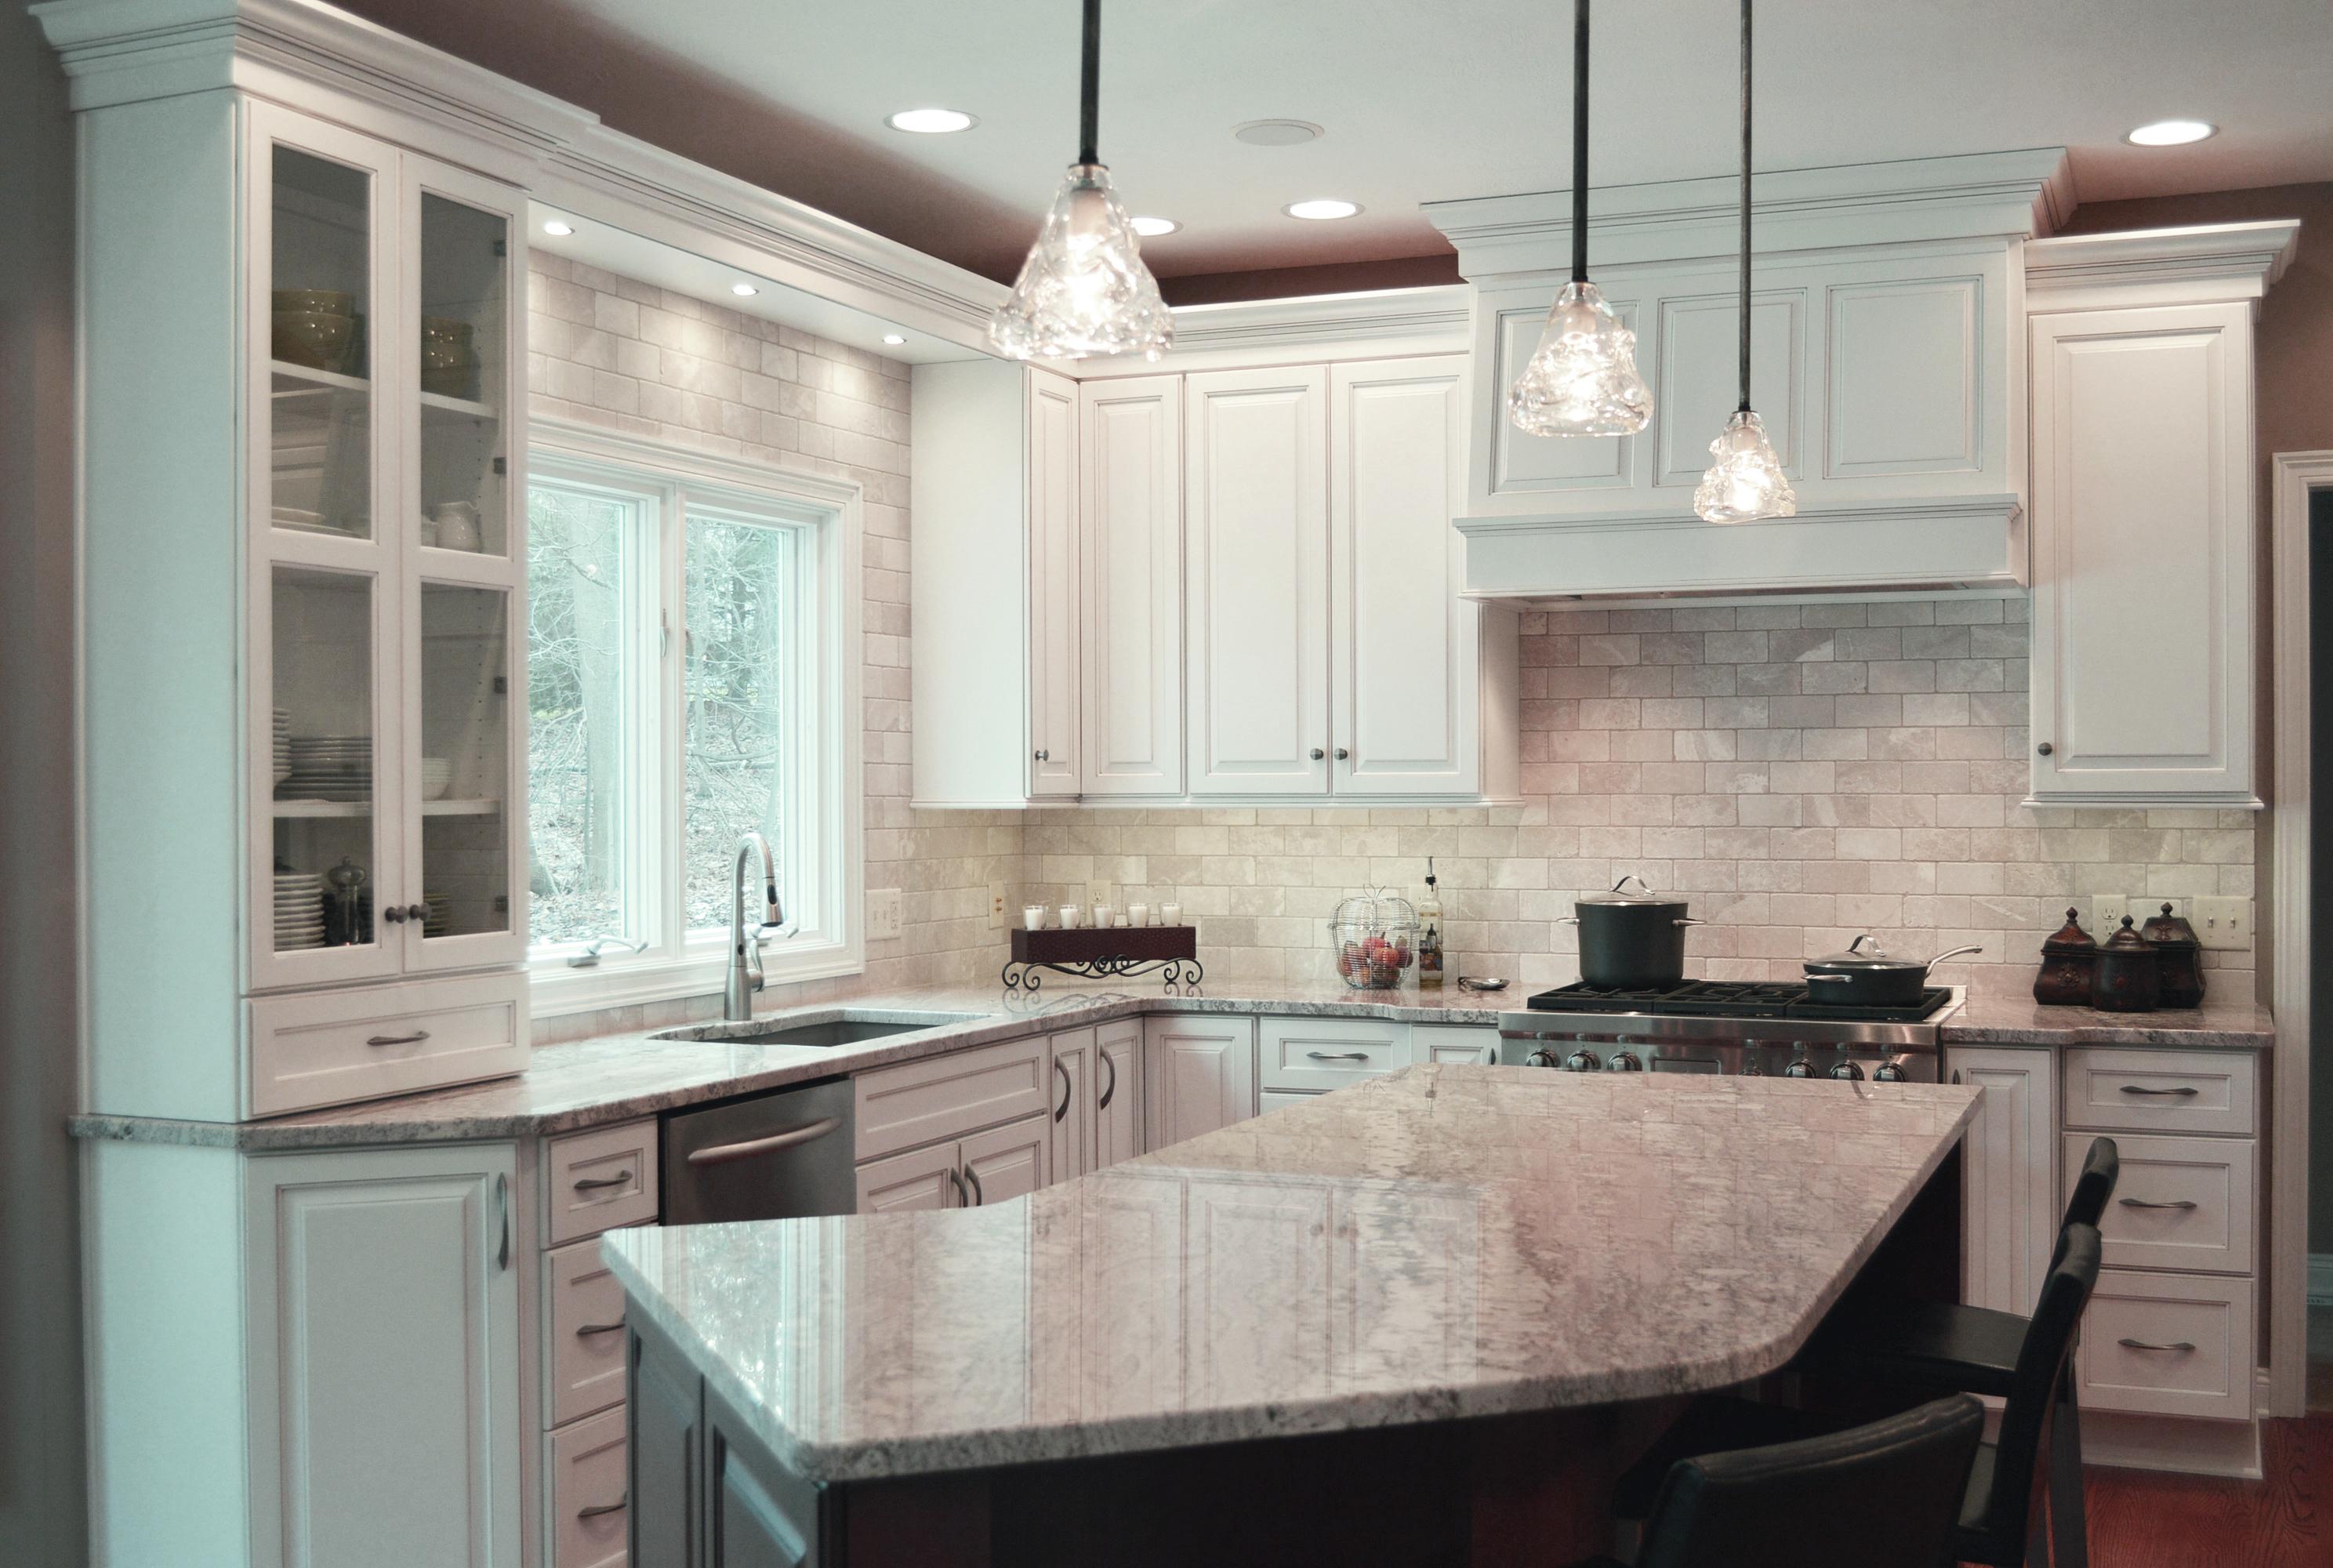 White thermofoil kitchen cabinets